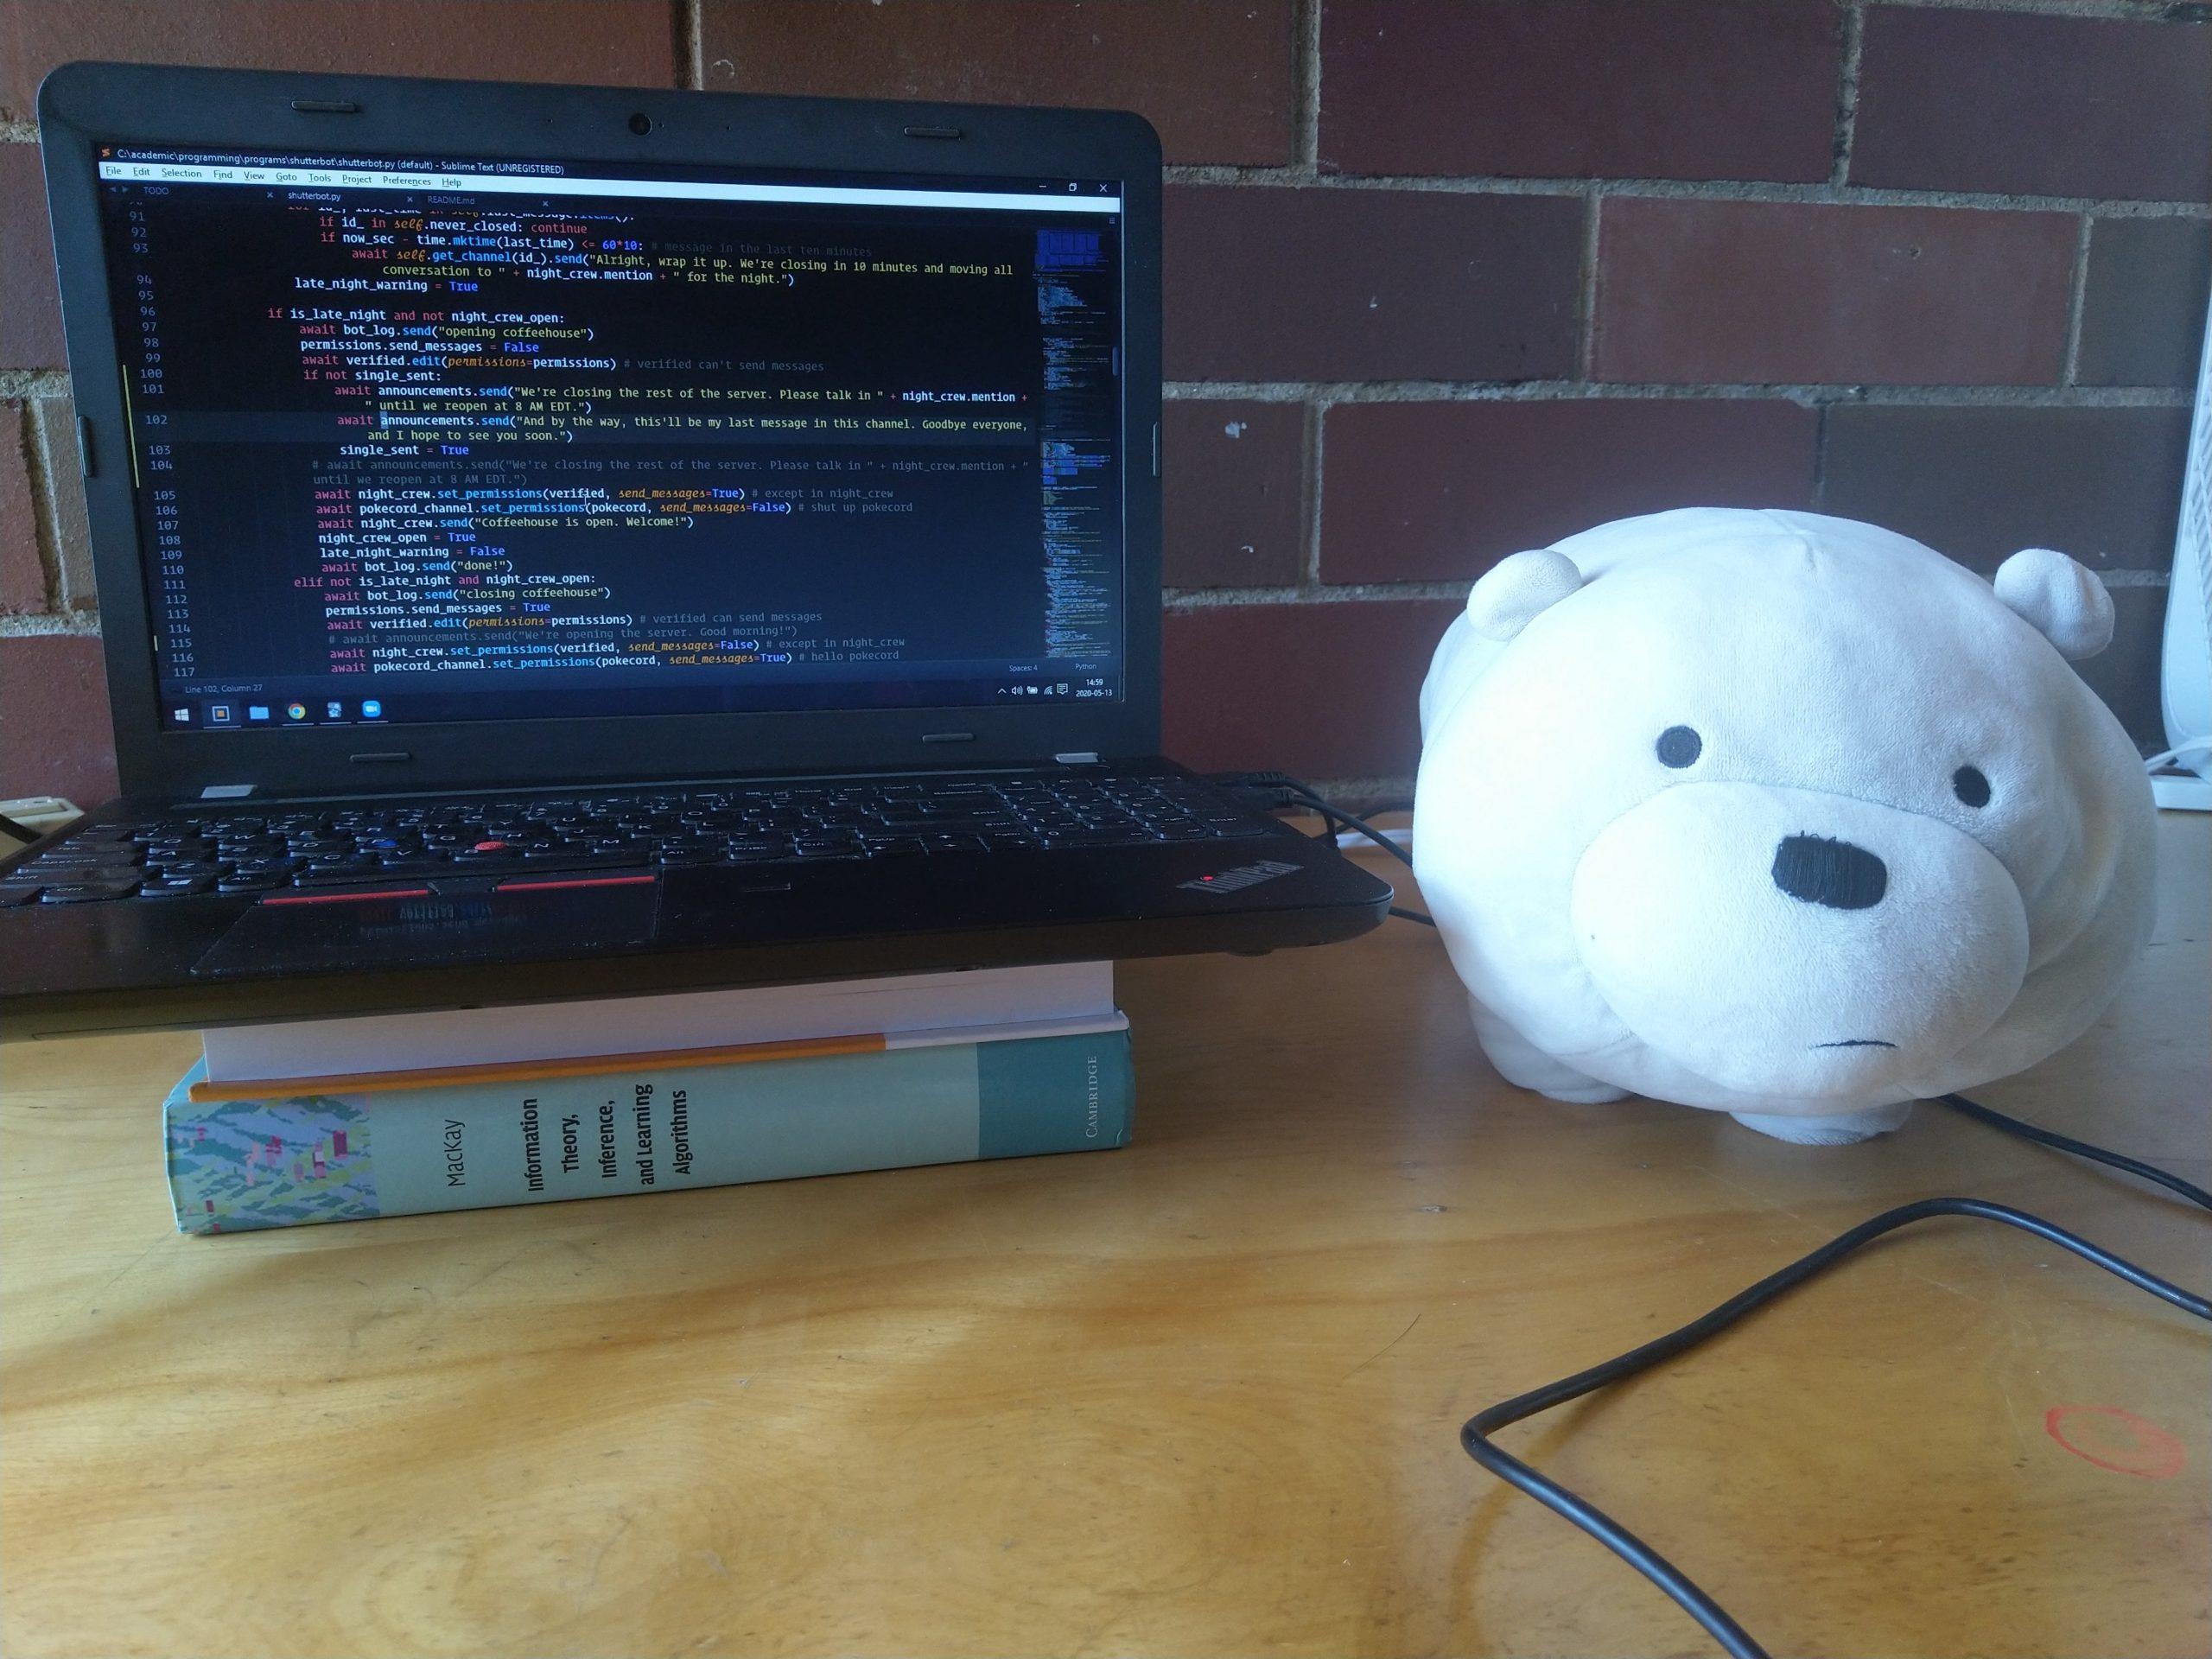 ice bear on my desk next to my laptop